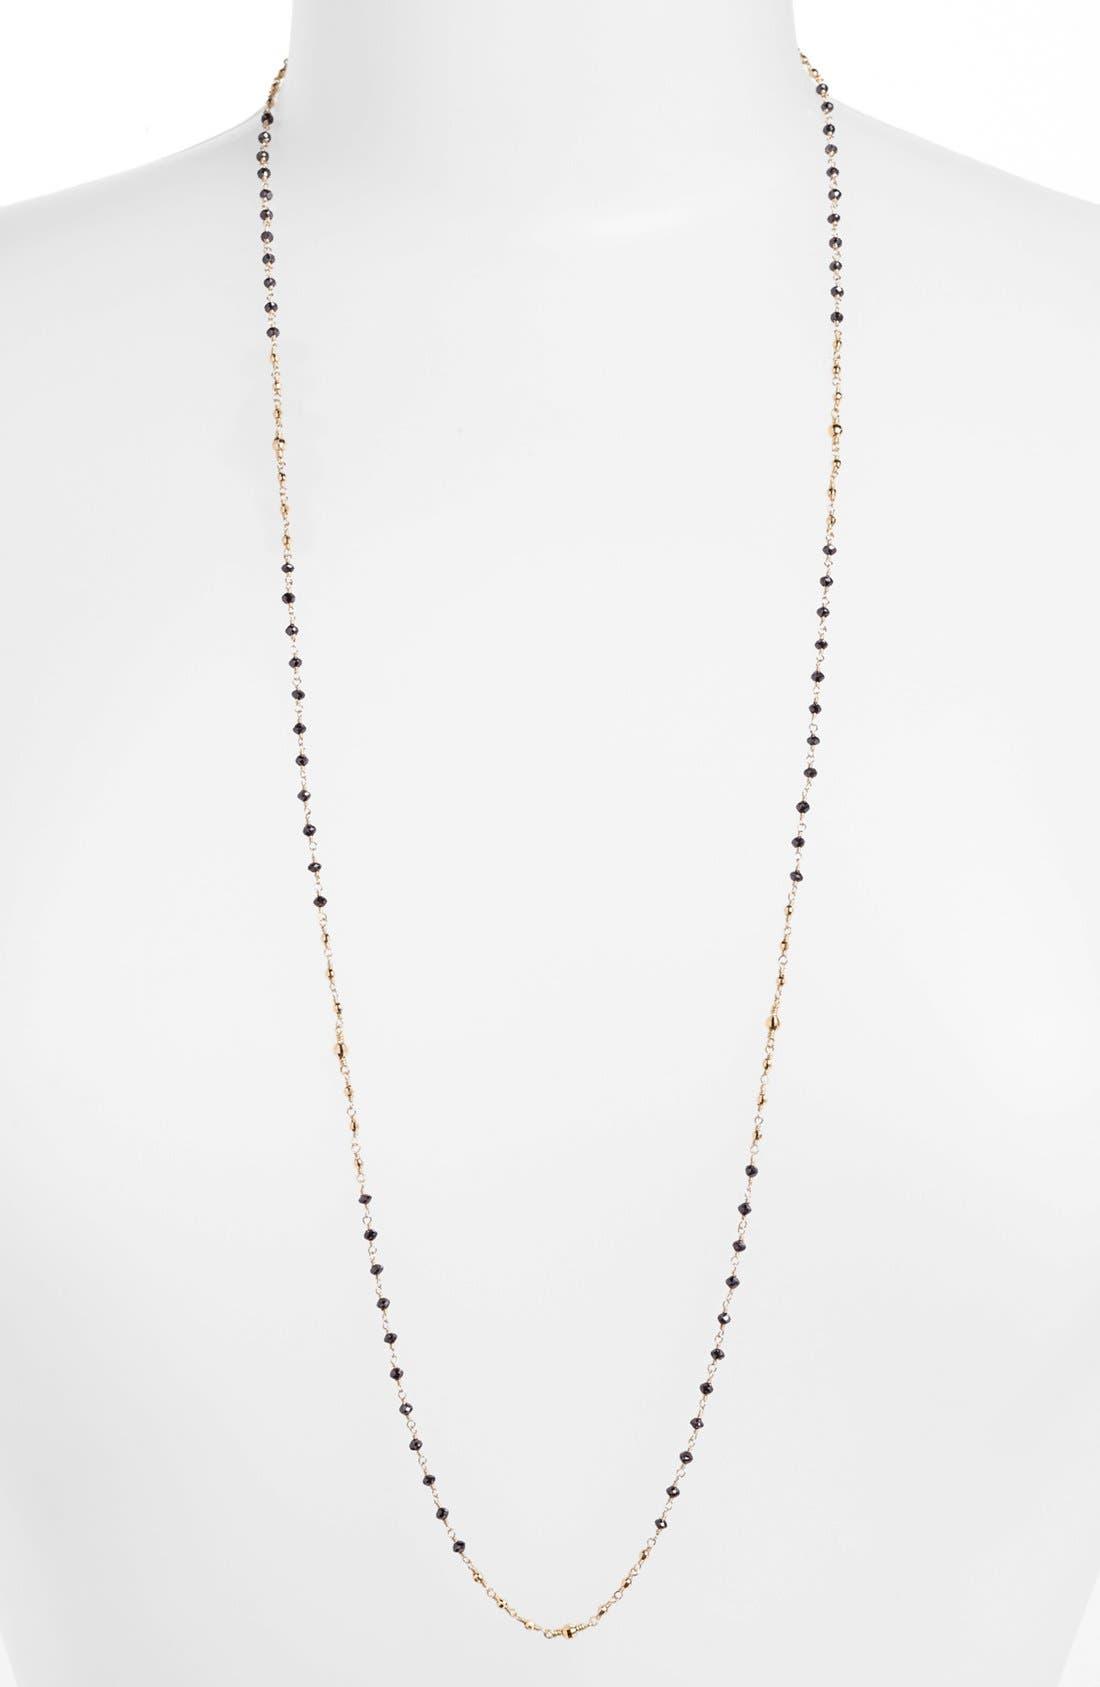 Alternate Image 1 Selected - Mizuki 'Cut Beads' Long Black Diamond Station Necklace